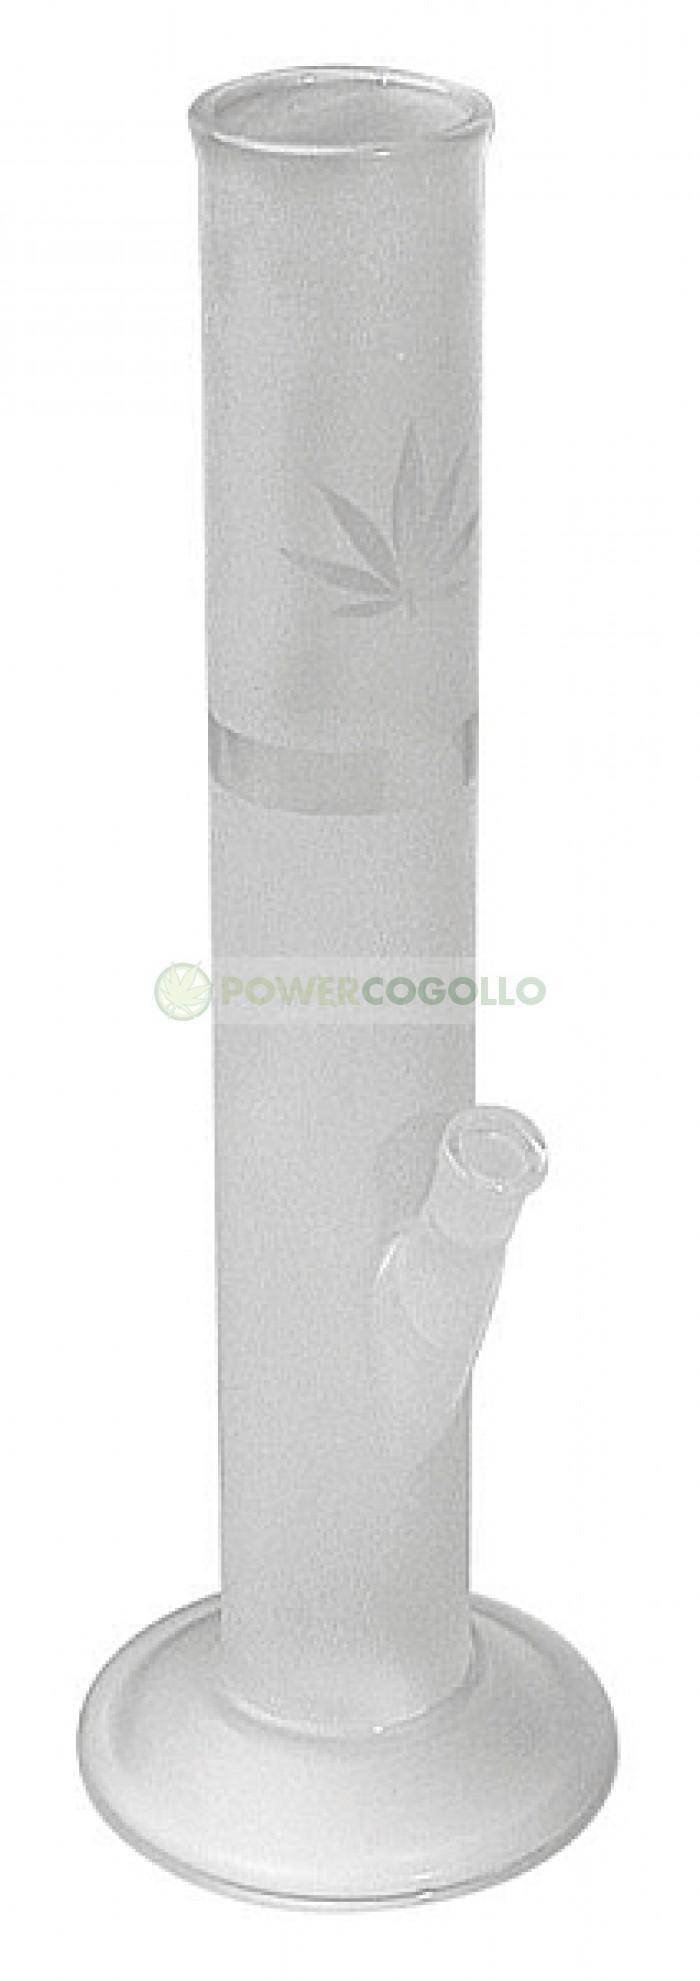 Bong Cristal Mate Tubo 40 cm